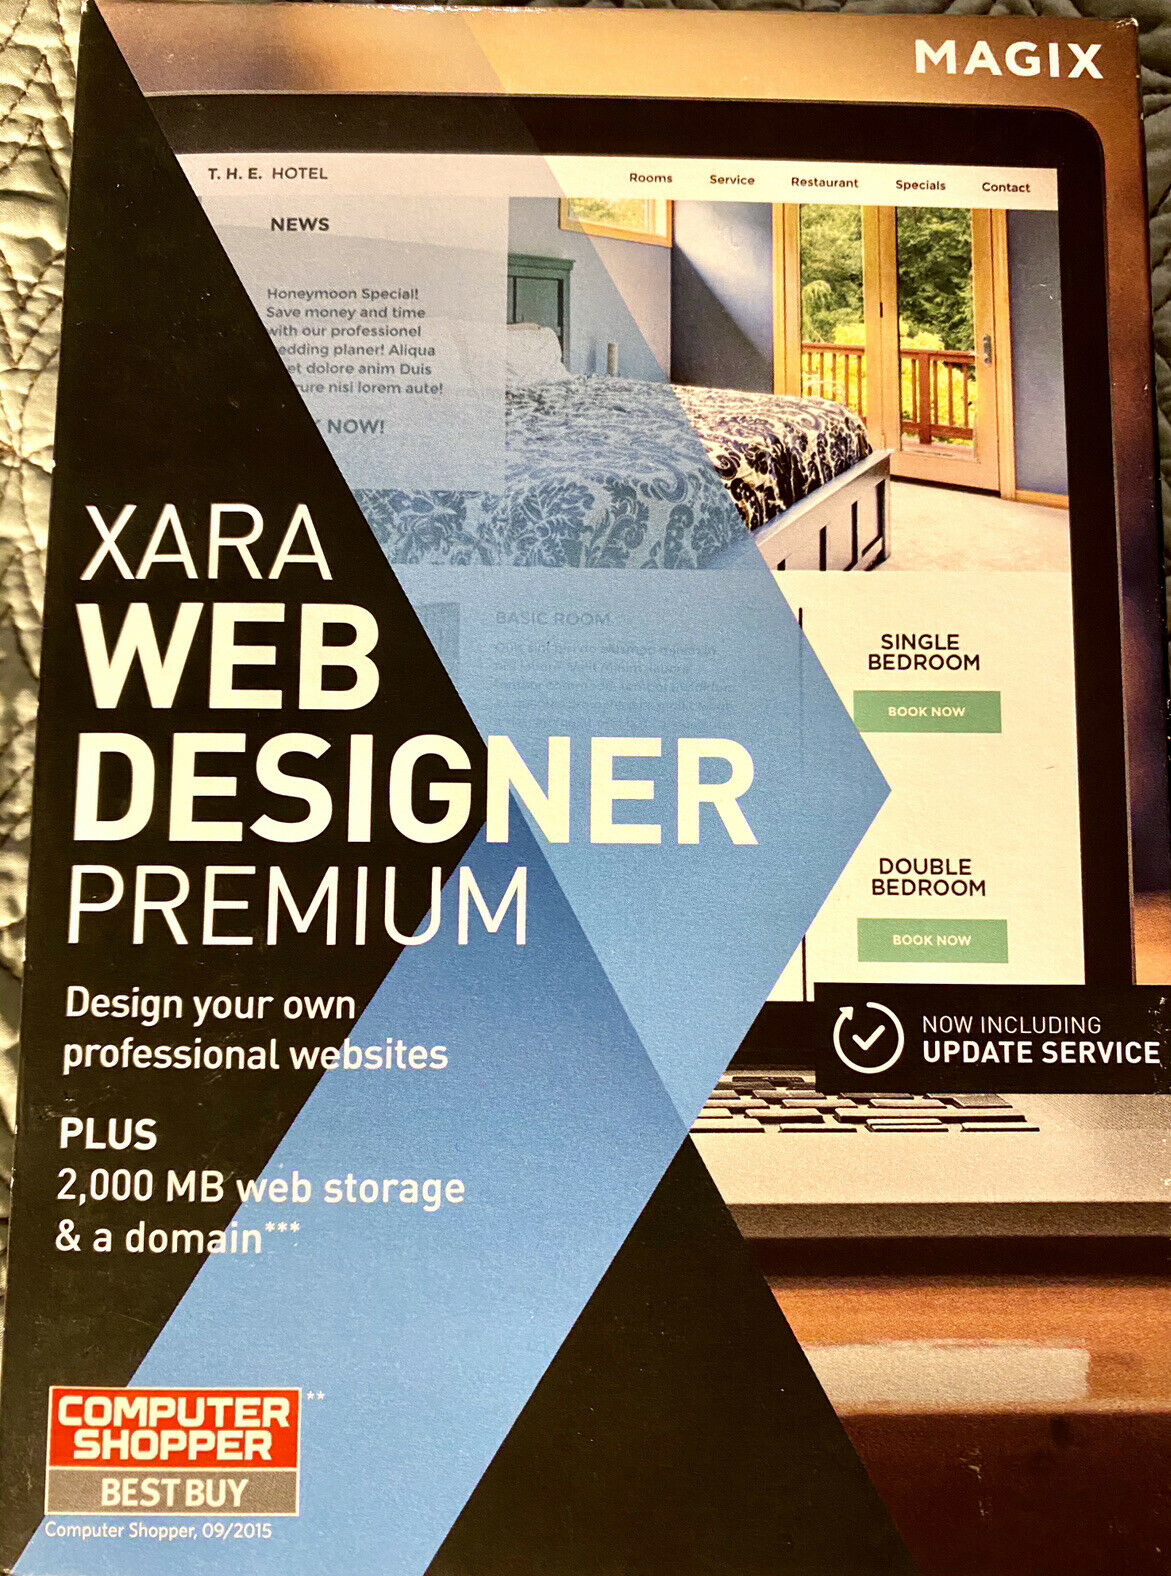 New Magix Xara Web Designer Premium Pc Software Download Sealed Box For Sale Online